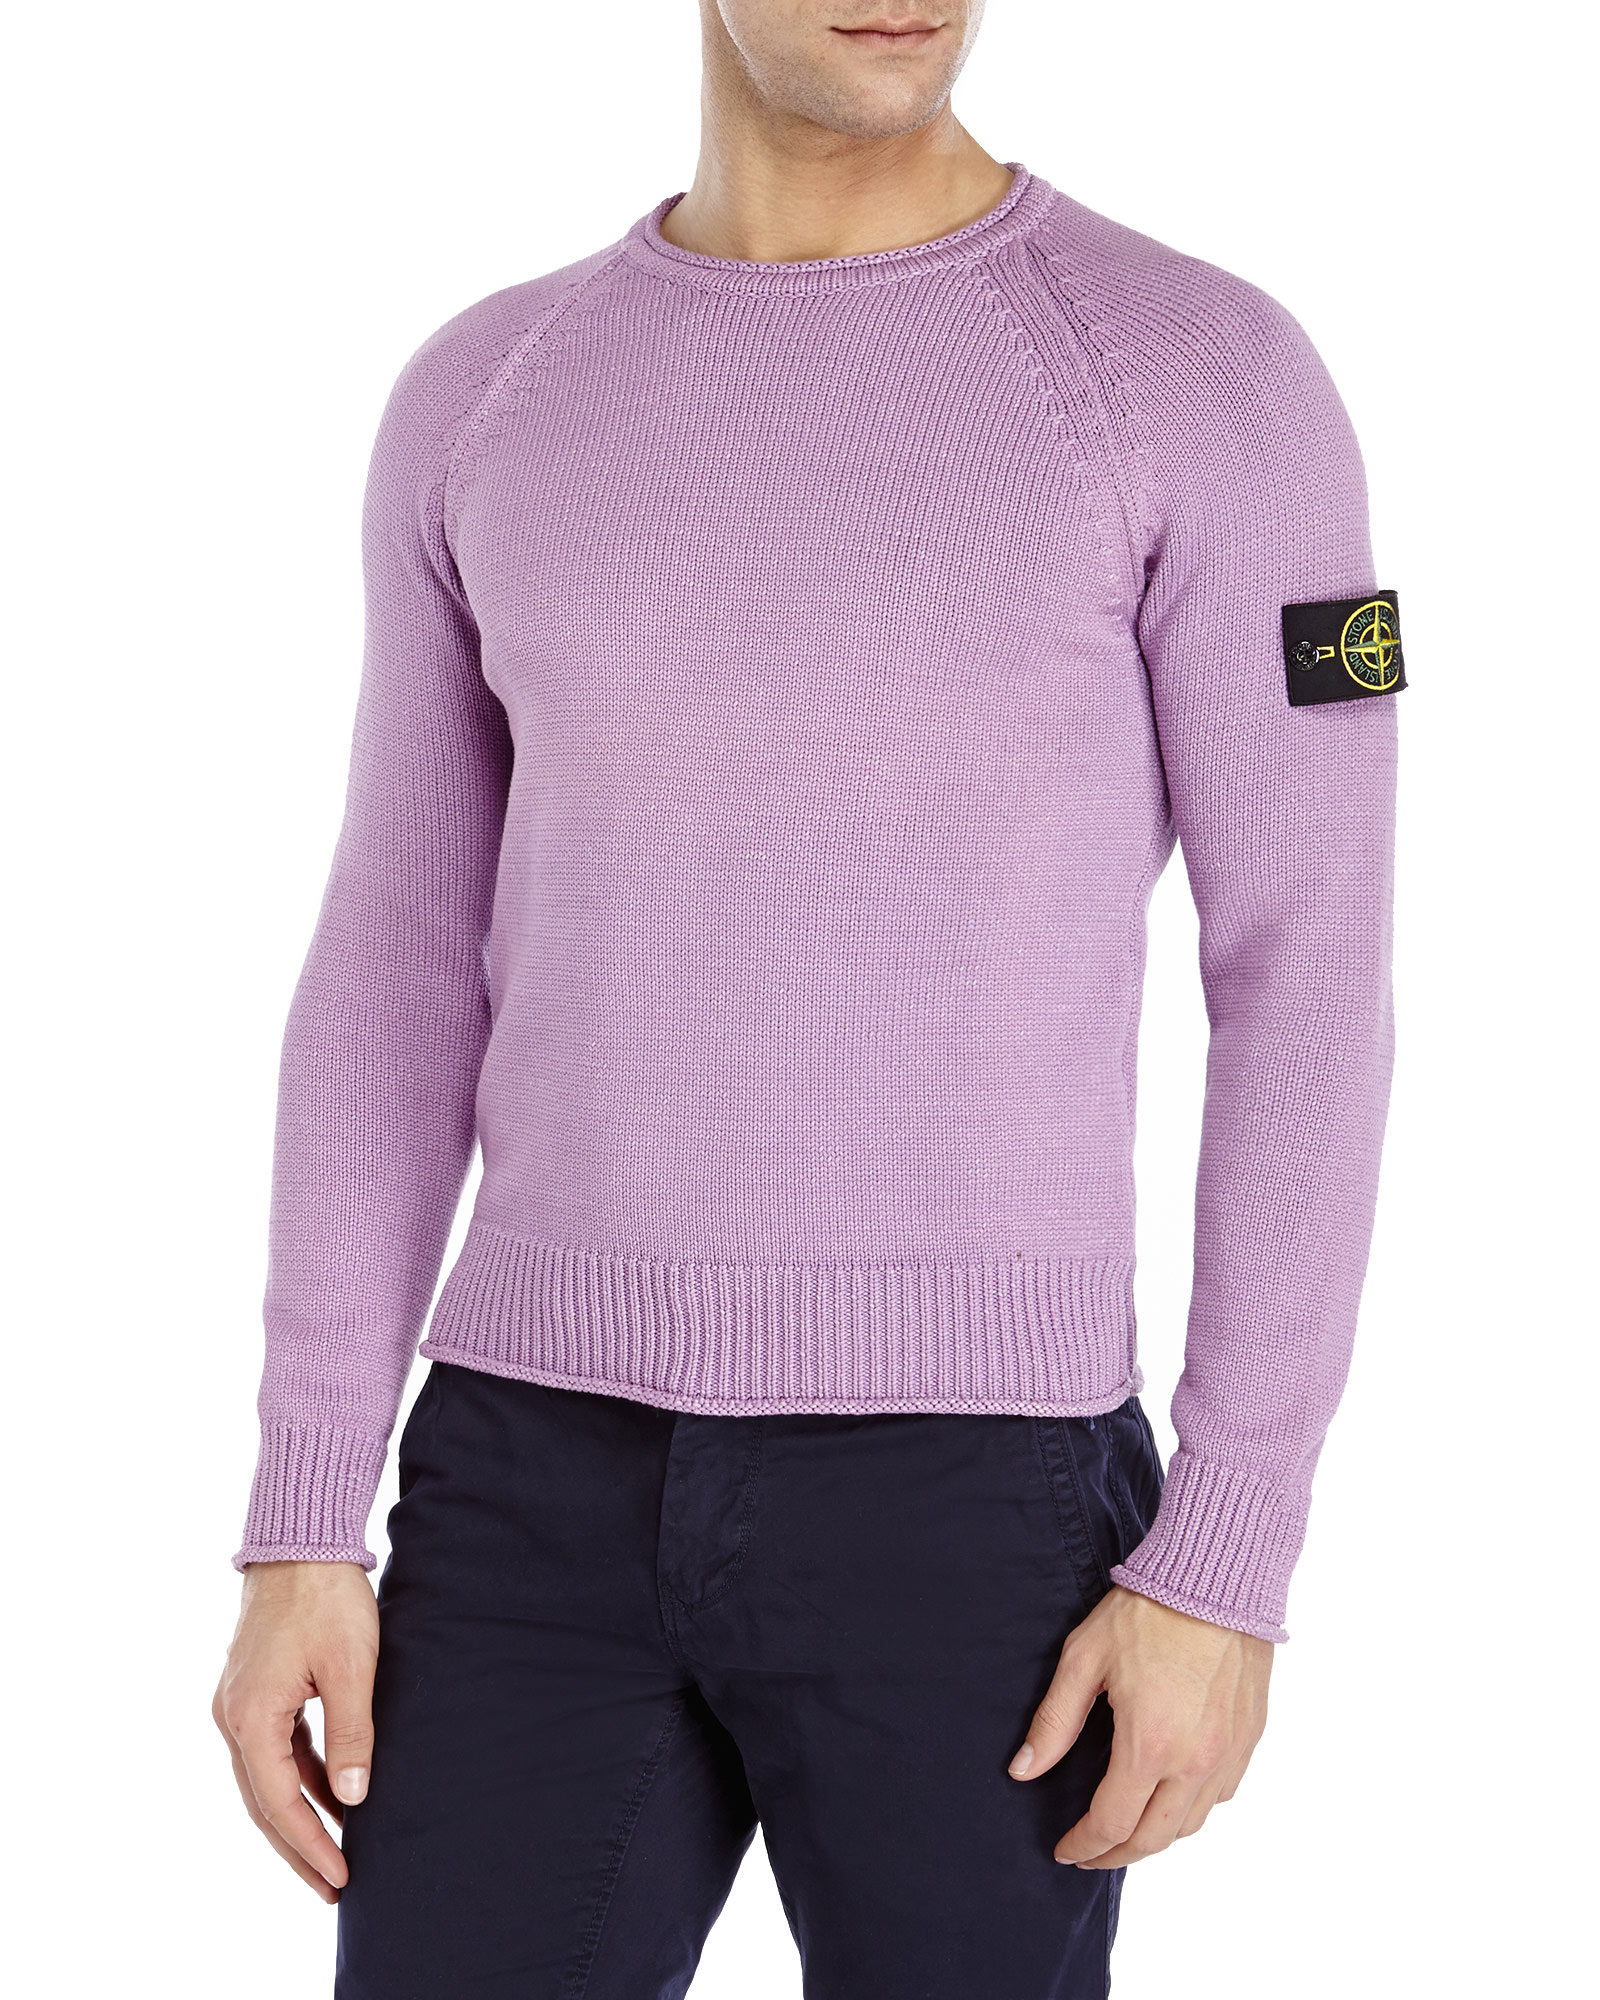 Stone island Crew Neck Knit Sweater in Purple for Men | Lyst